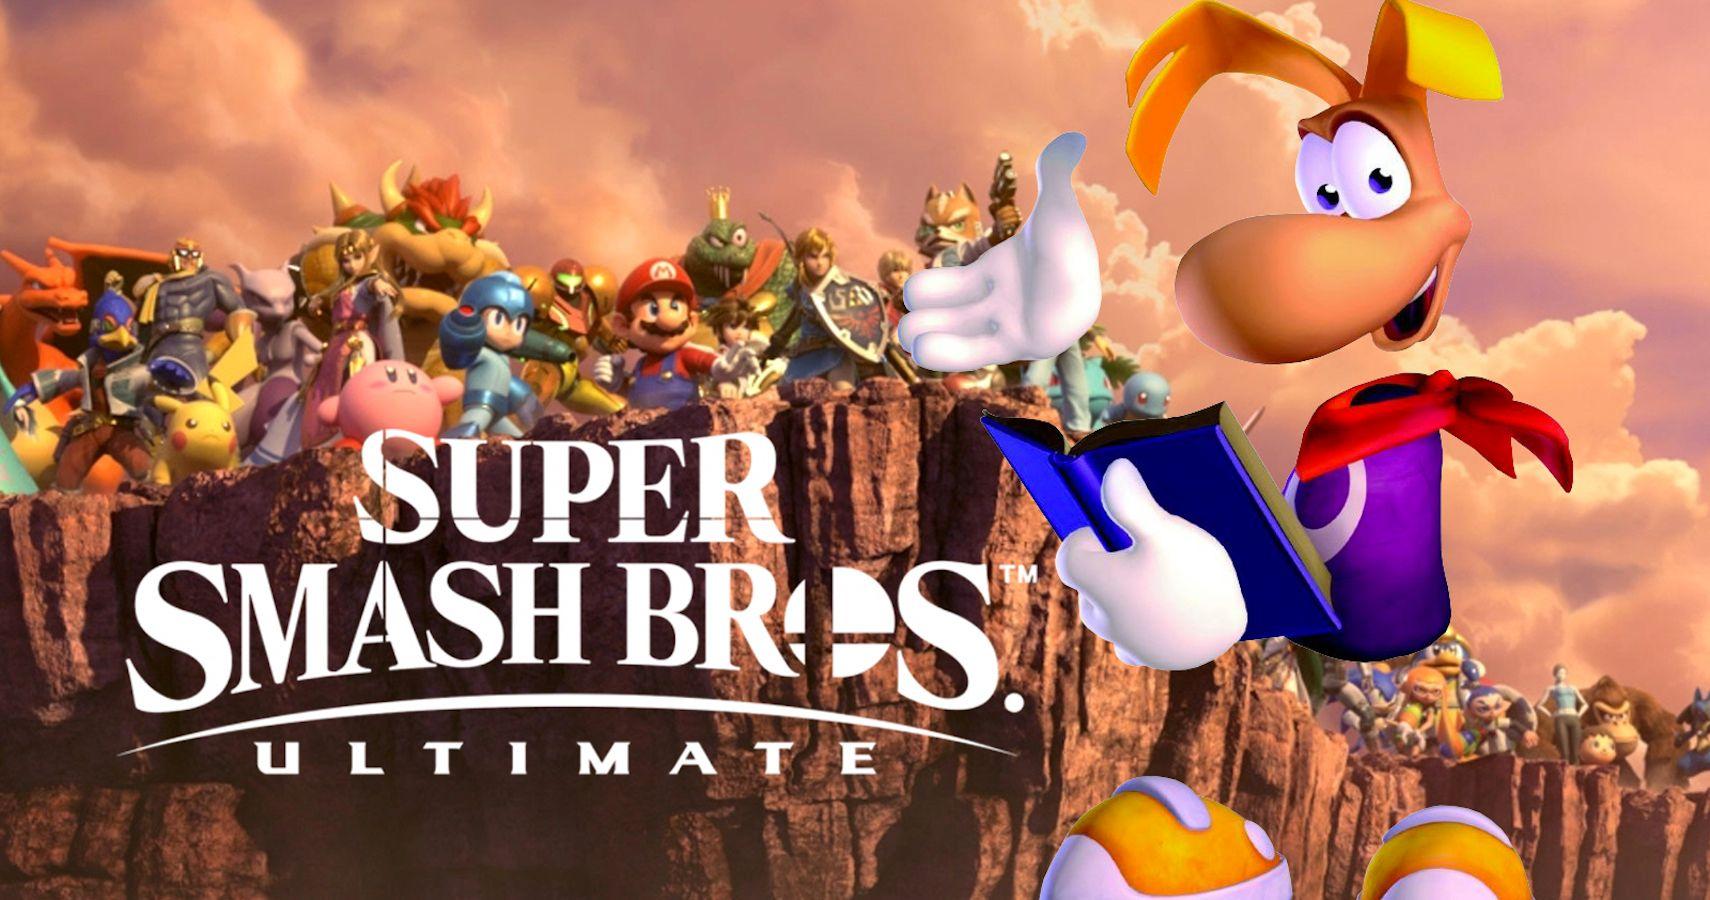 Rumor: The Next Smash Ultimate DLC Character Has Been Hiding In